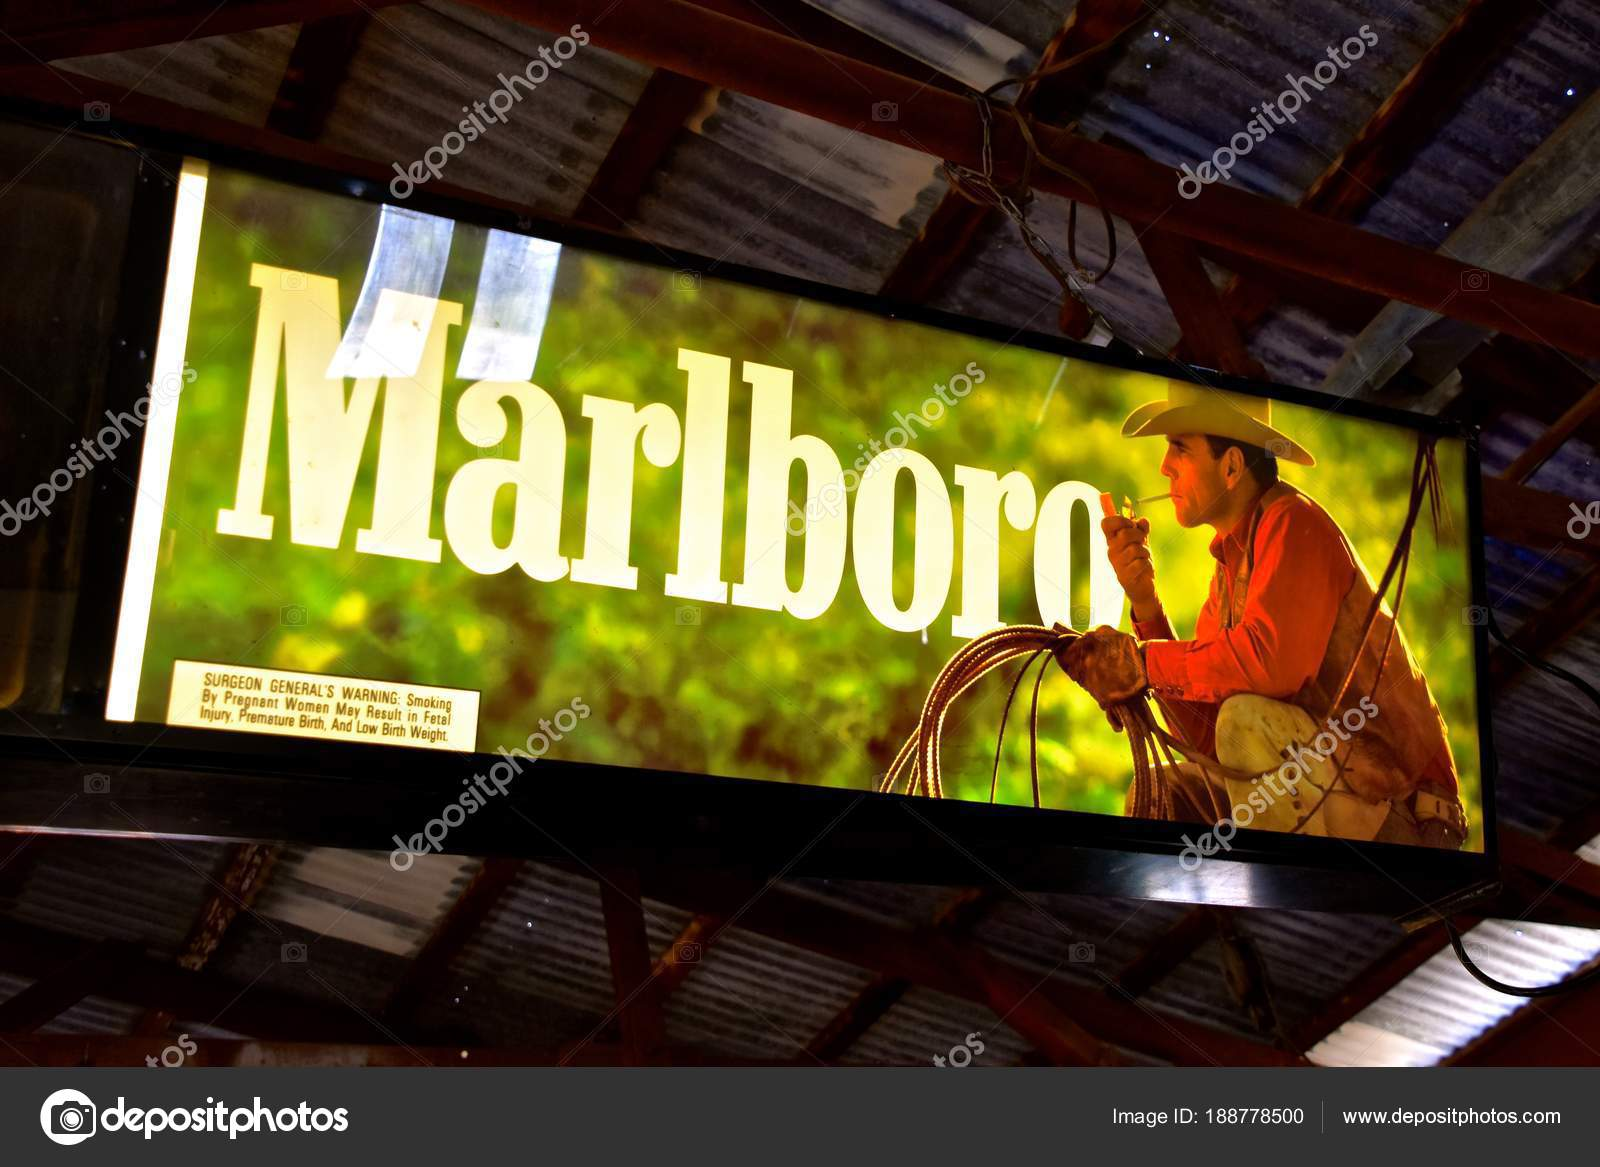 How to buy cigarettes Marlboro in Georgia